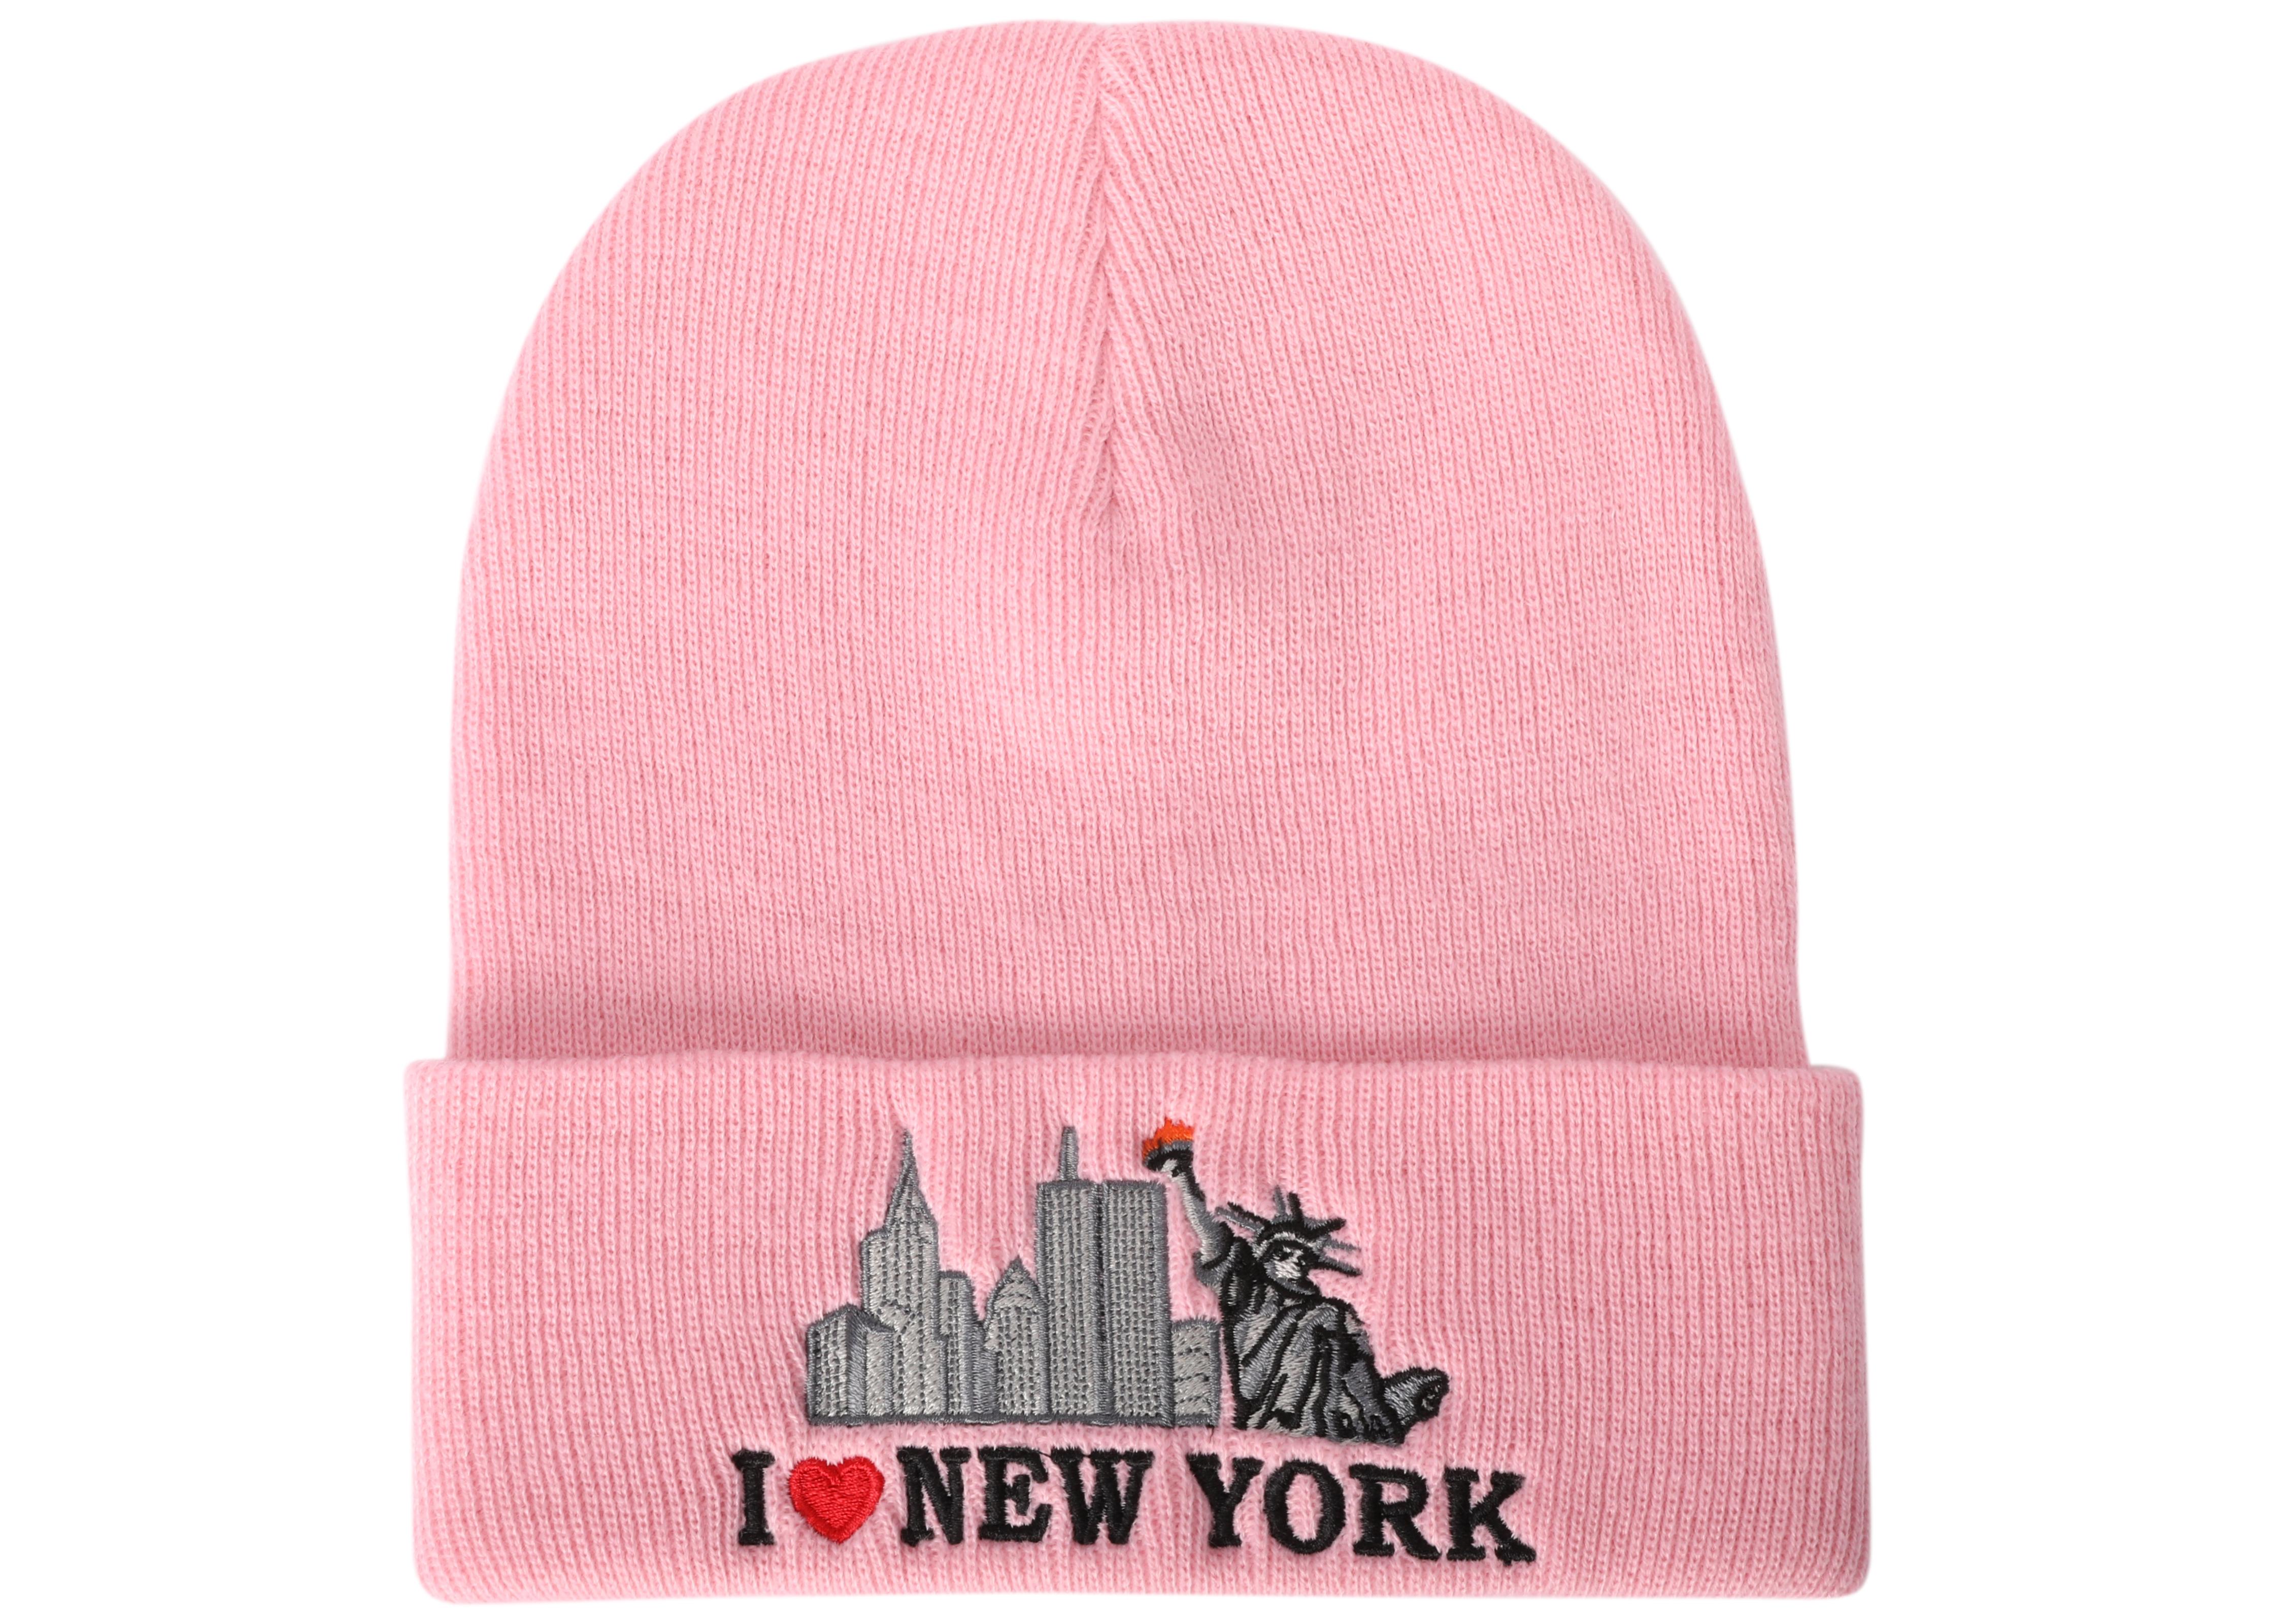 fd0dd1433e1 Sell or ask view all bids supreme i love beanie pink jpg 1400x1000 New york  supreme